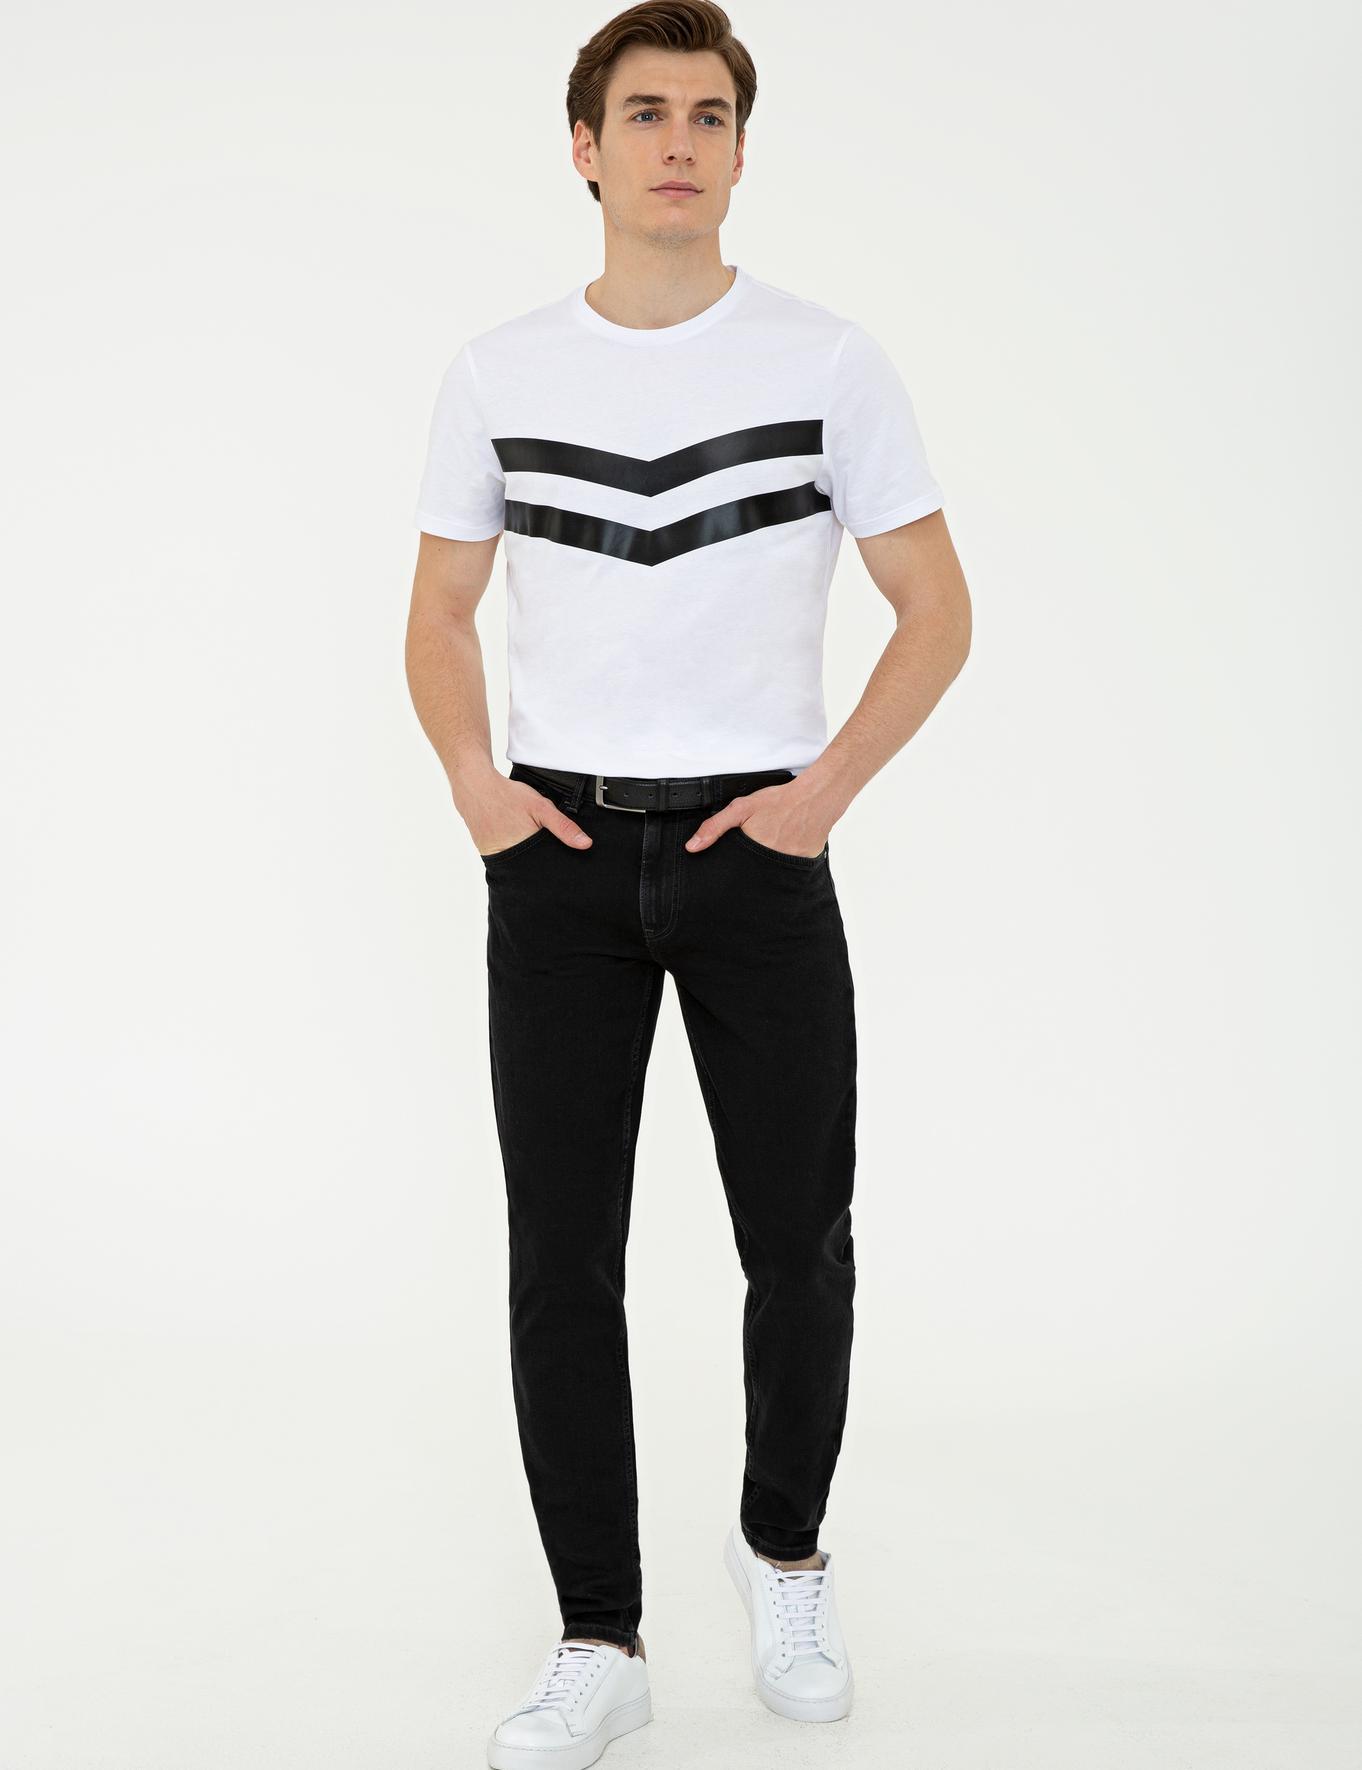 Koyu Gri Slim Fit Denim - 50235794065